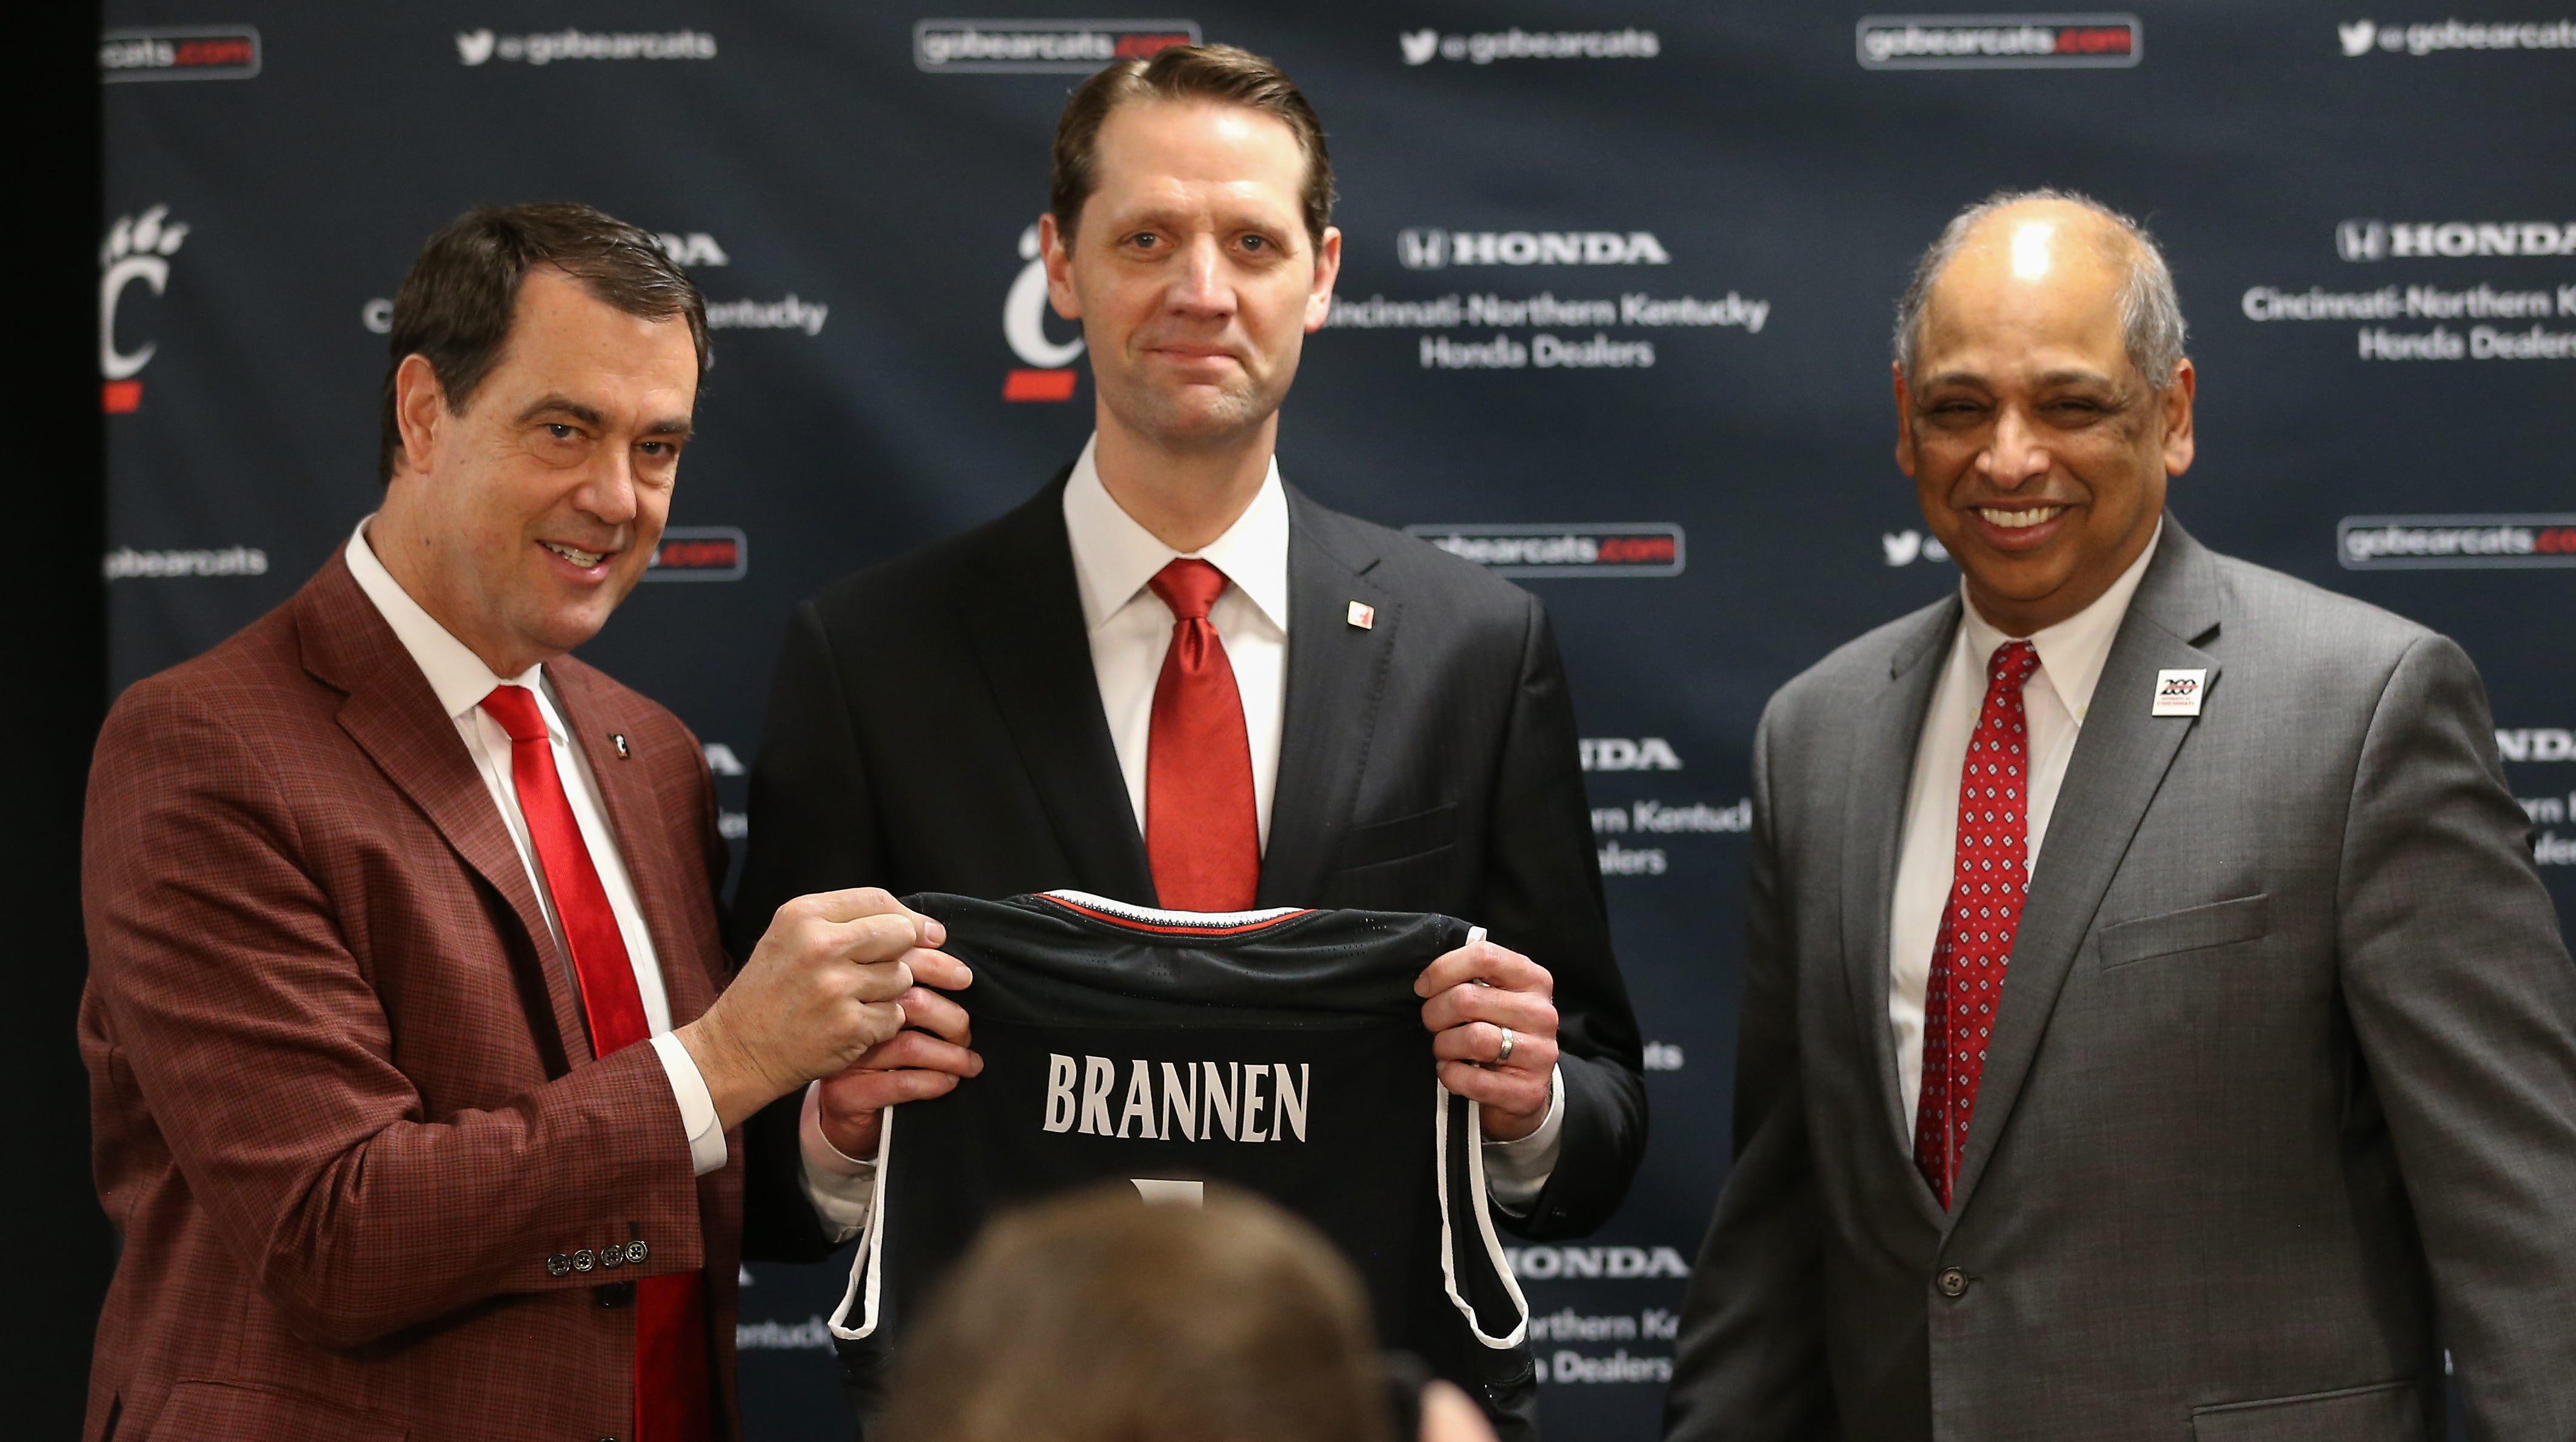 John Brannen introduced as University of Cincinnati men's basketball coach